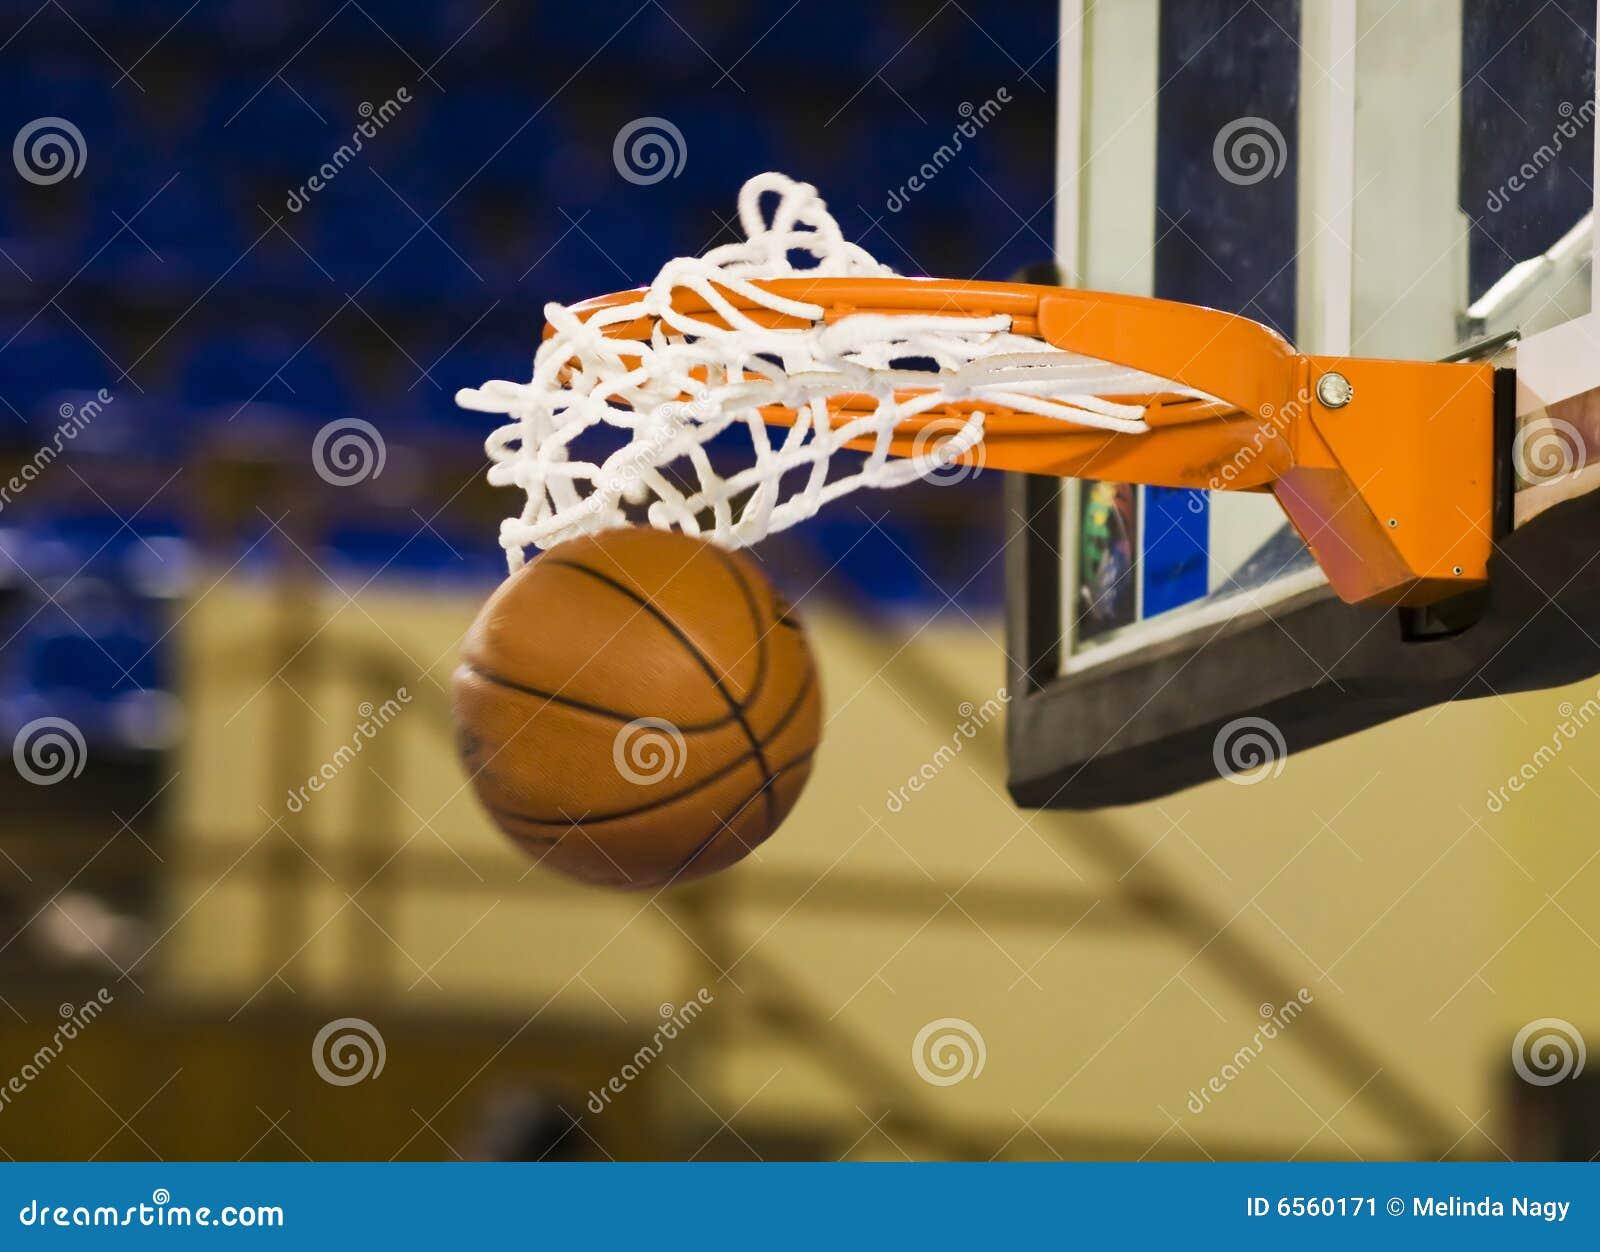 Ball in the hoop